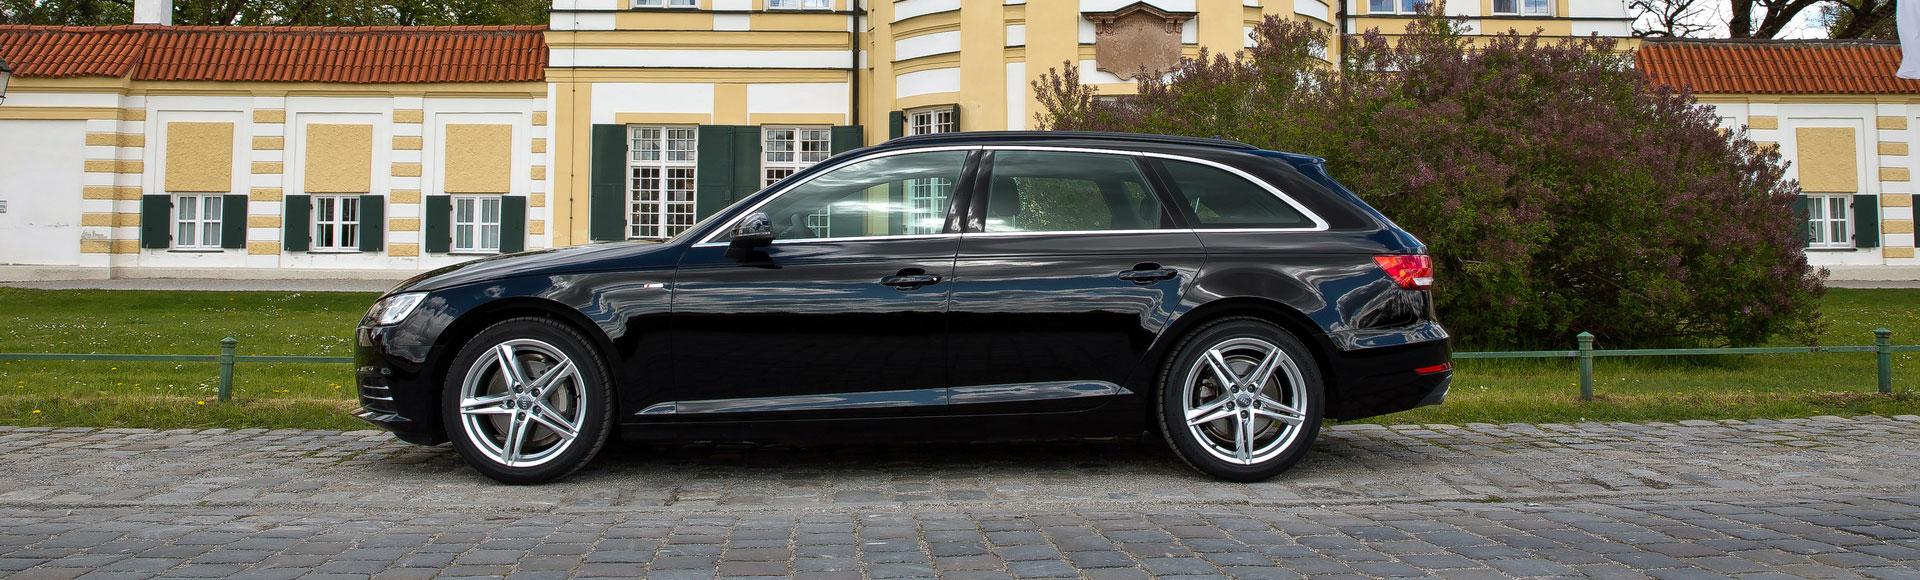 Audi A4 Avant 2016 Spring 281